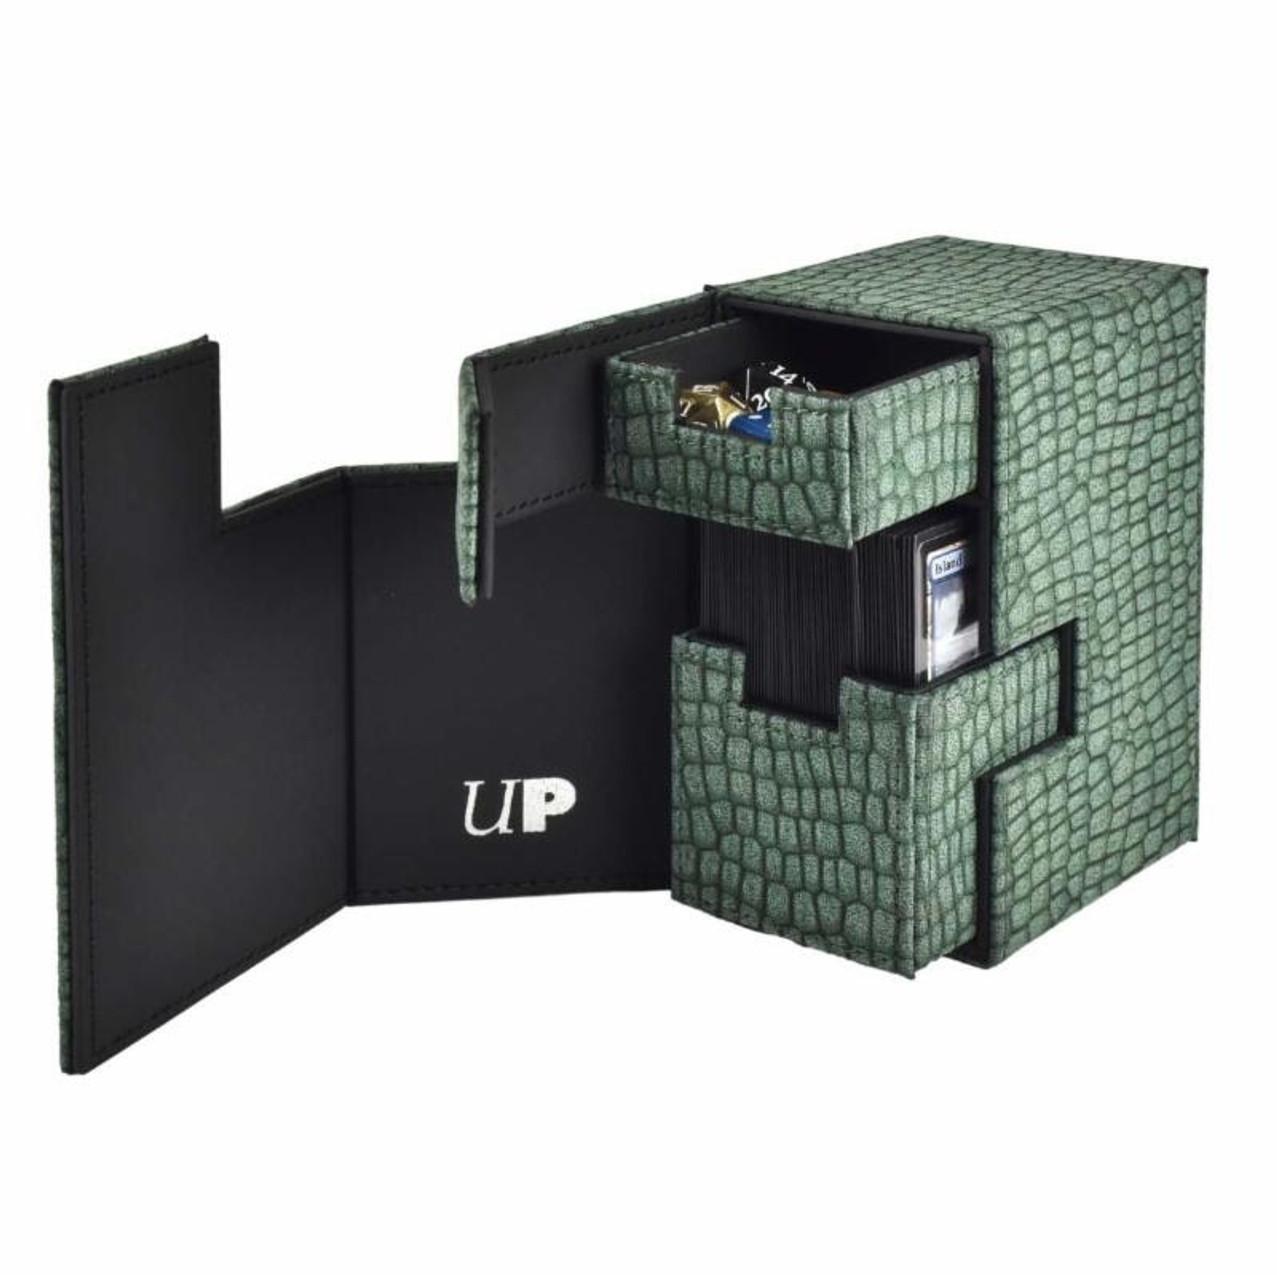 Deck Box M2 - Lizard Skin - Special Order